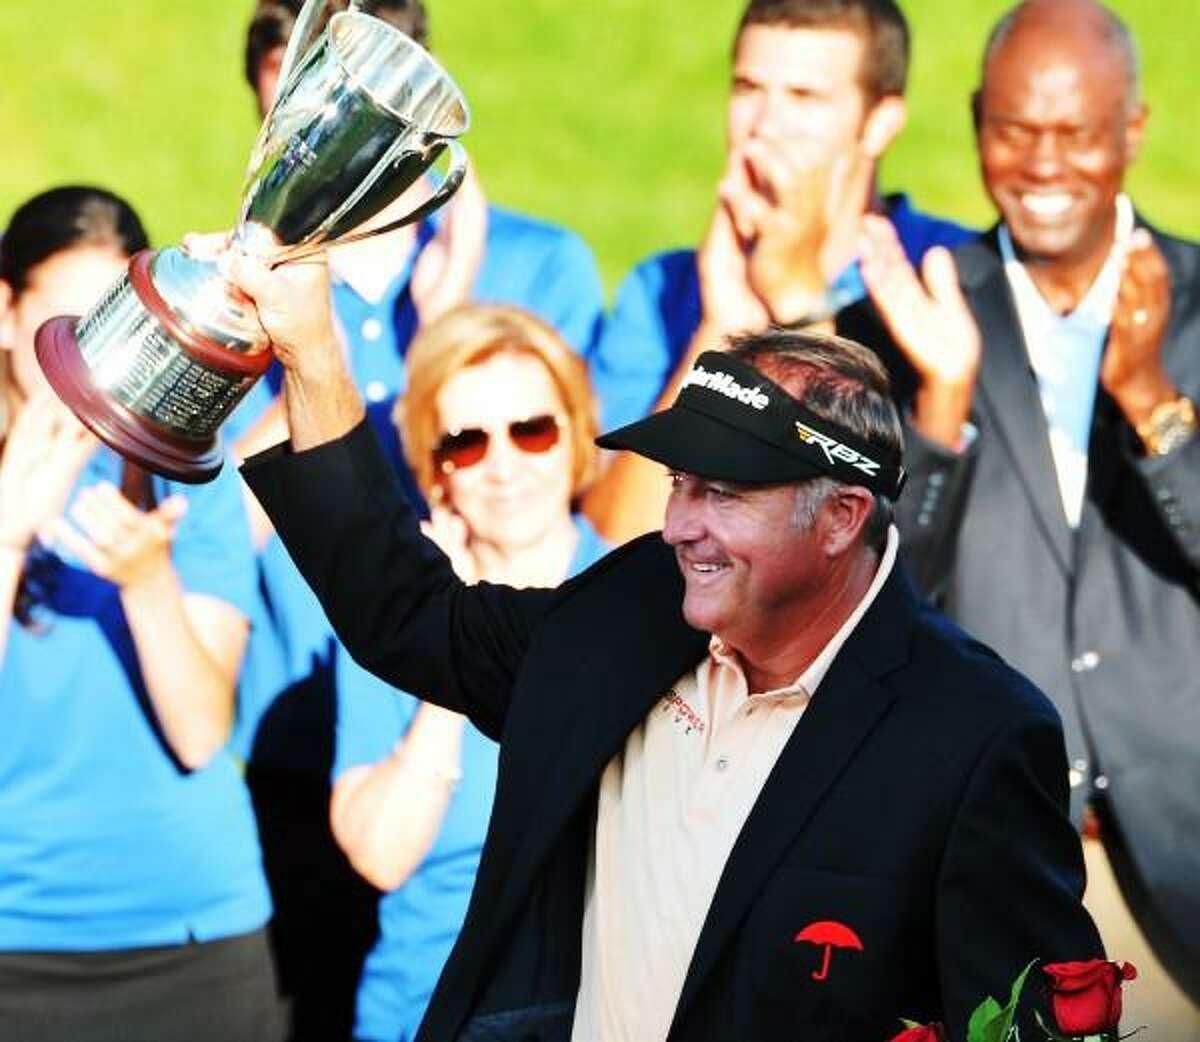 Peter Casolino â?? June 23, 2013- Ken Duke hoists the trophy after winning the 2013 Travelers Championship. pcasolino@newhavenregister.com